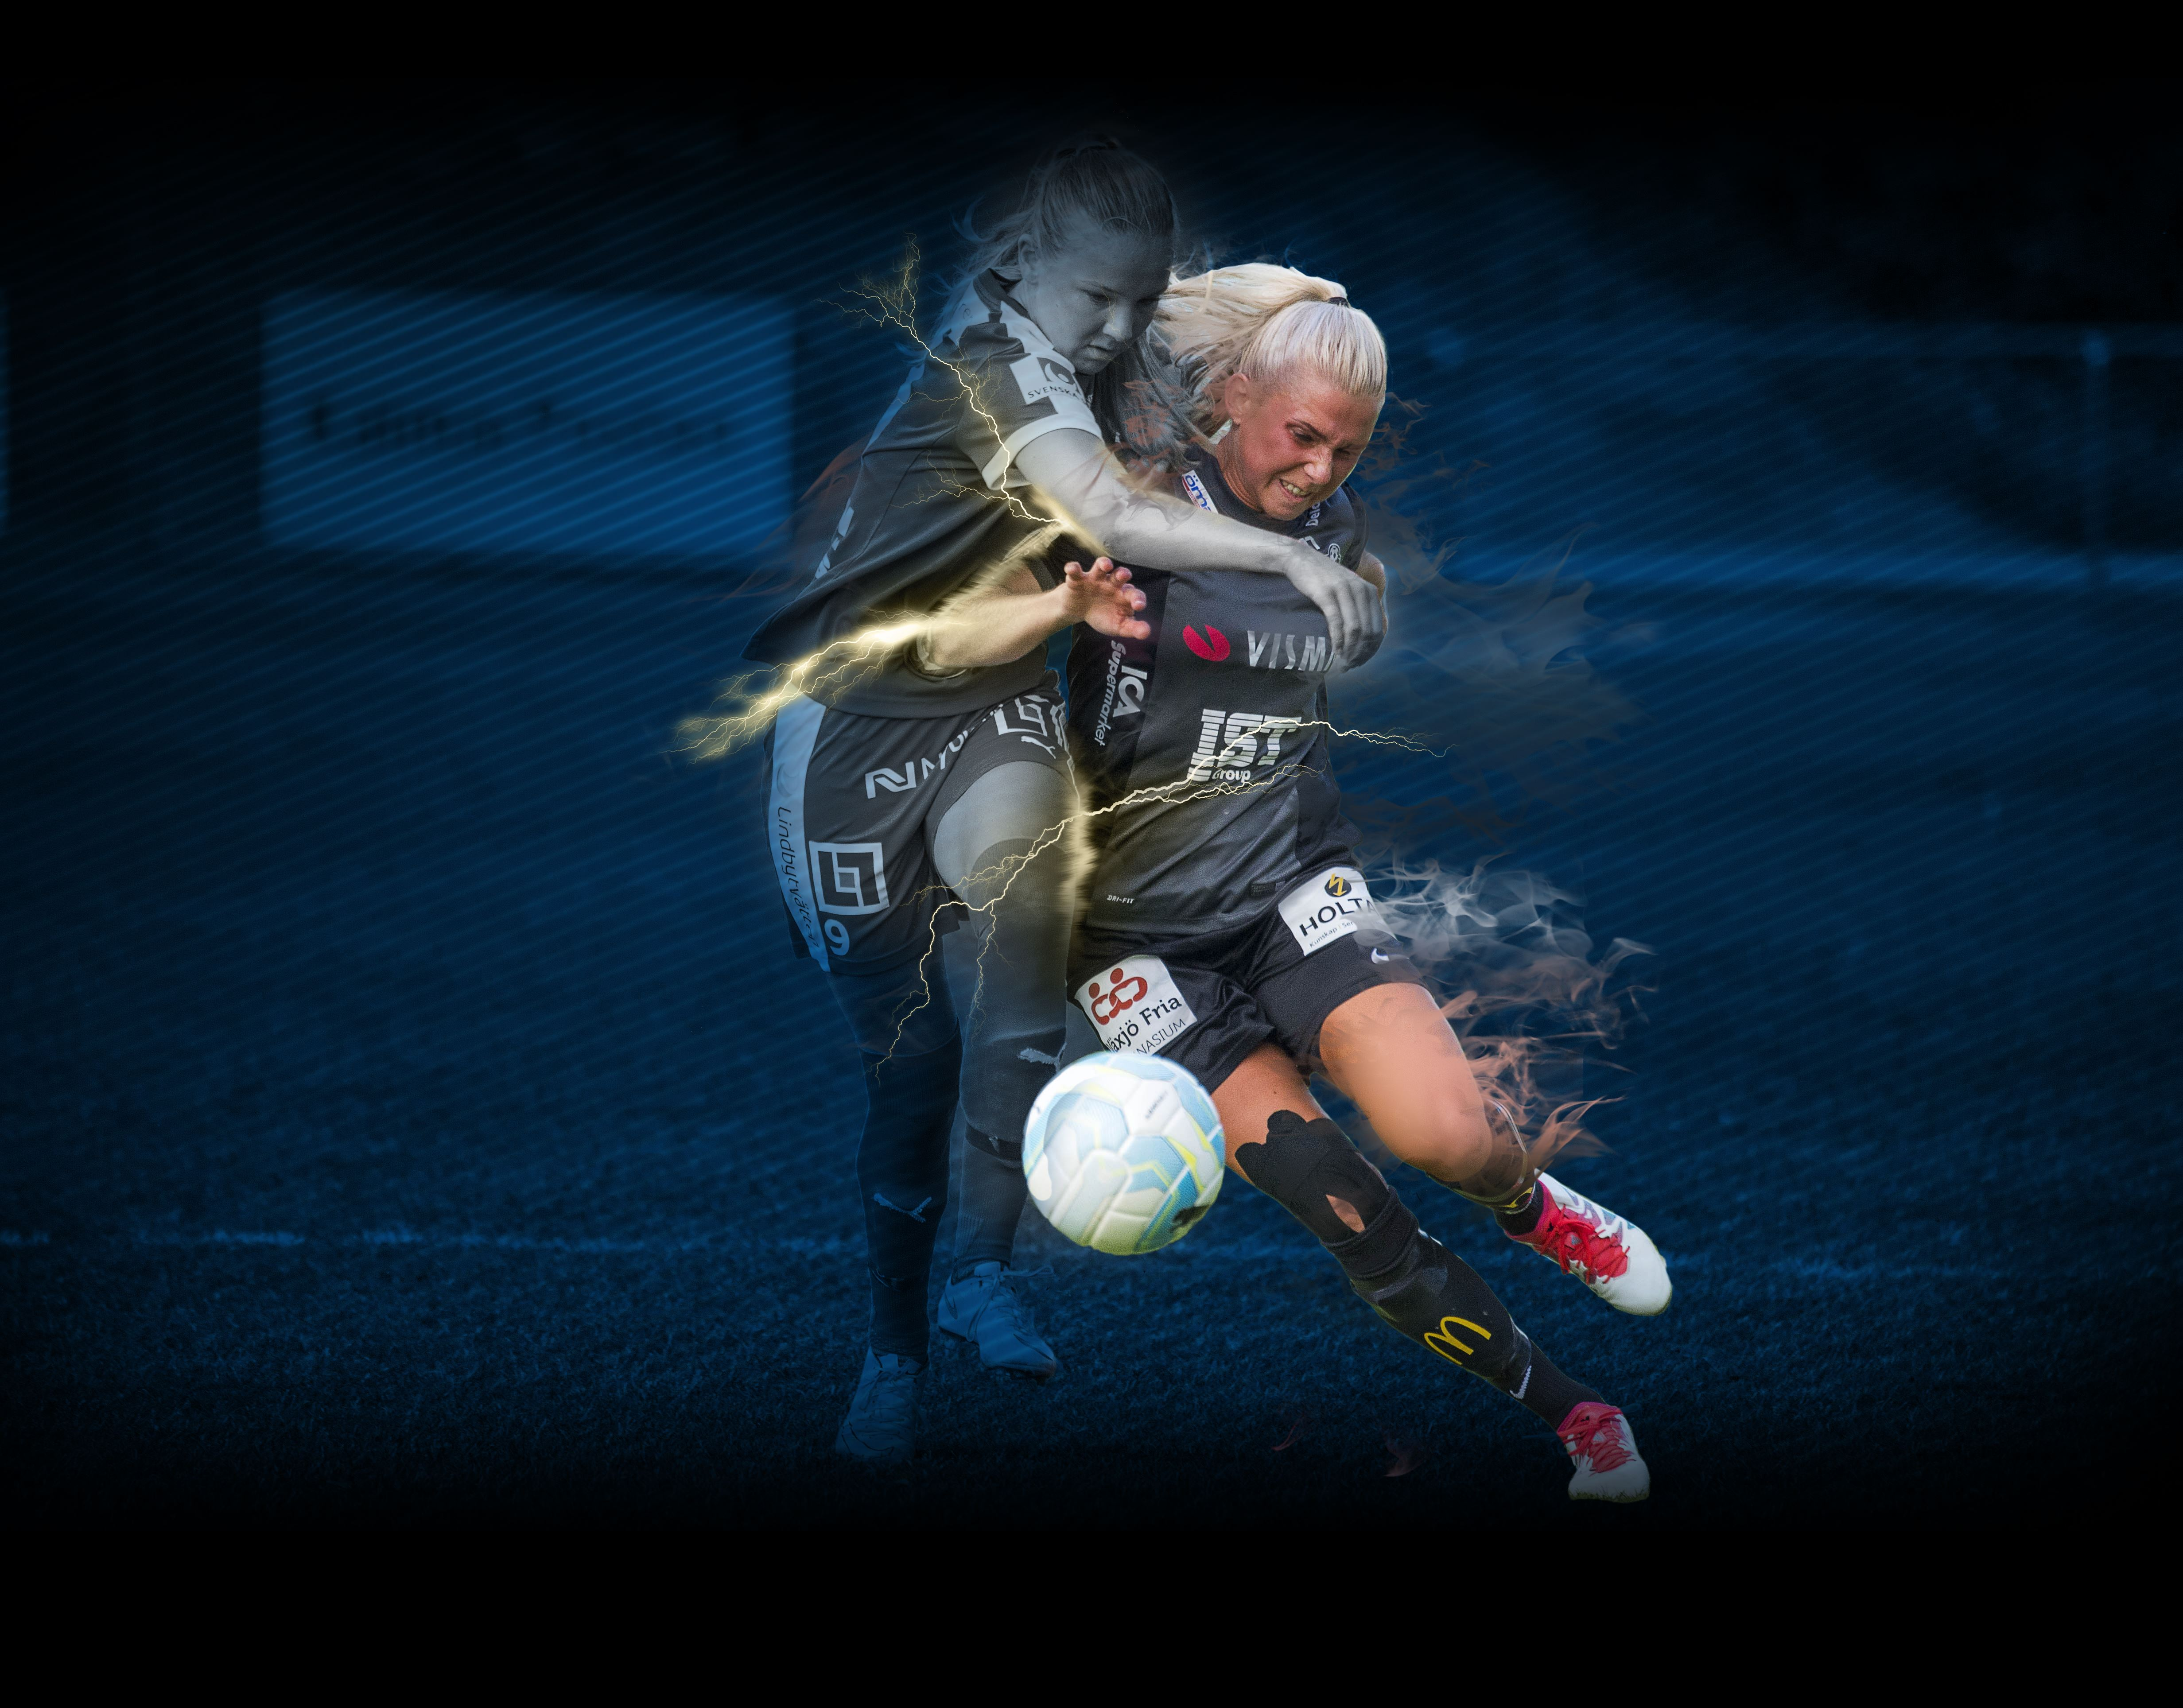 Fotboll: Växjö DFF - IFK Kalmar